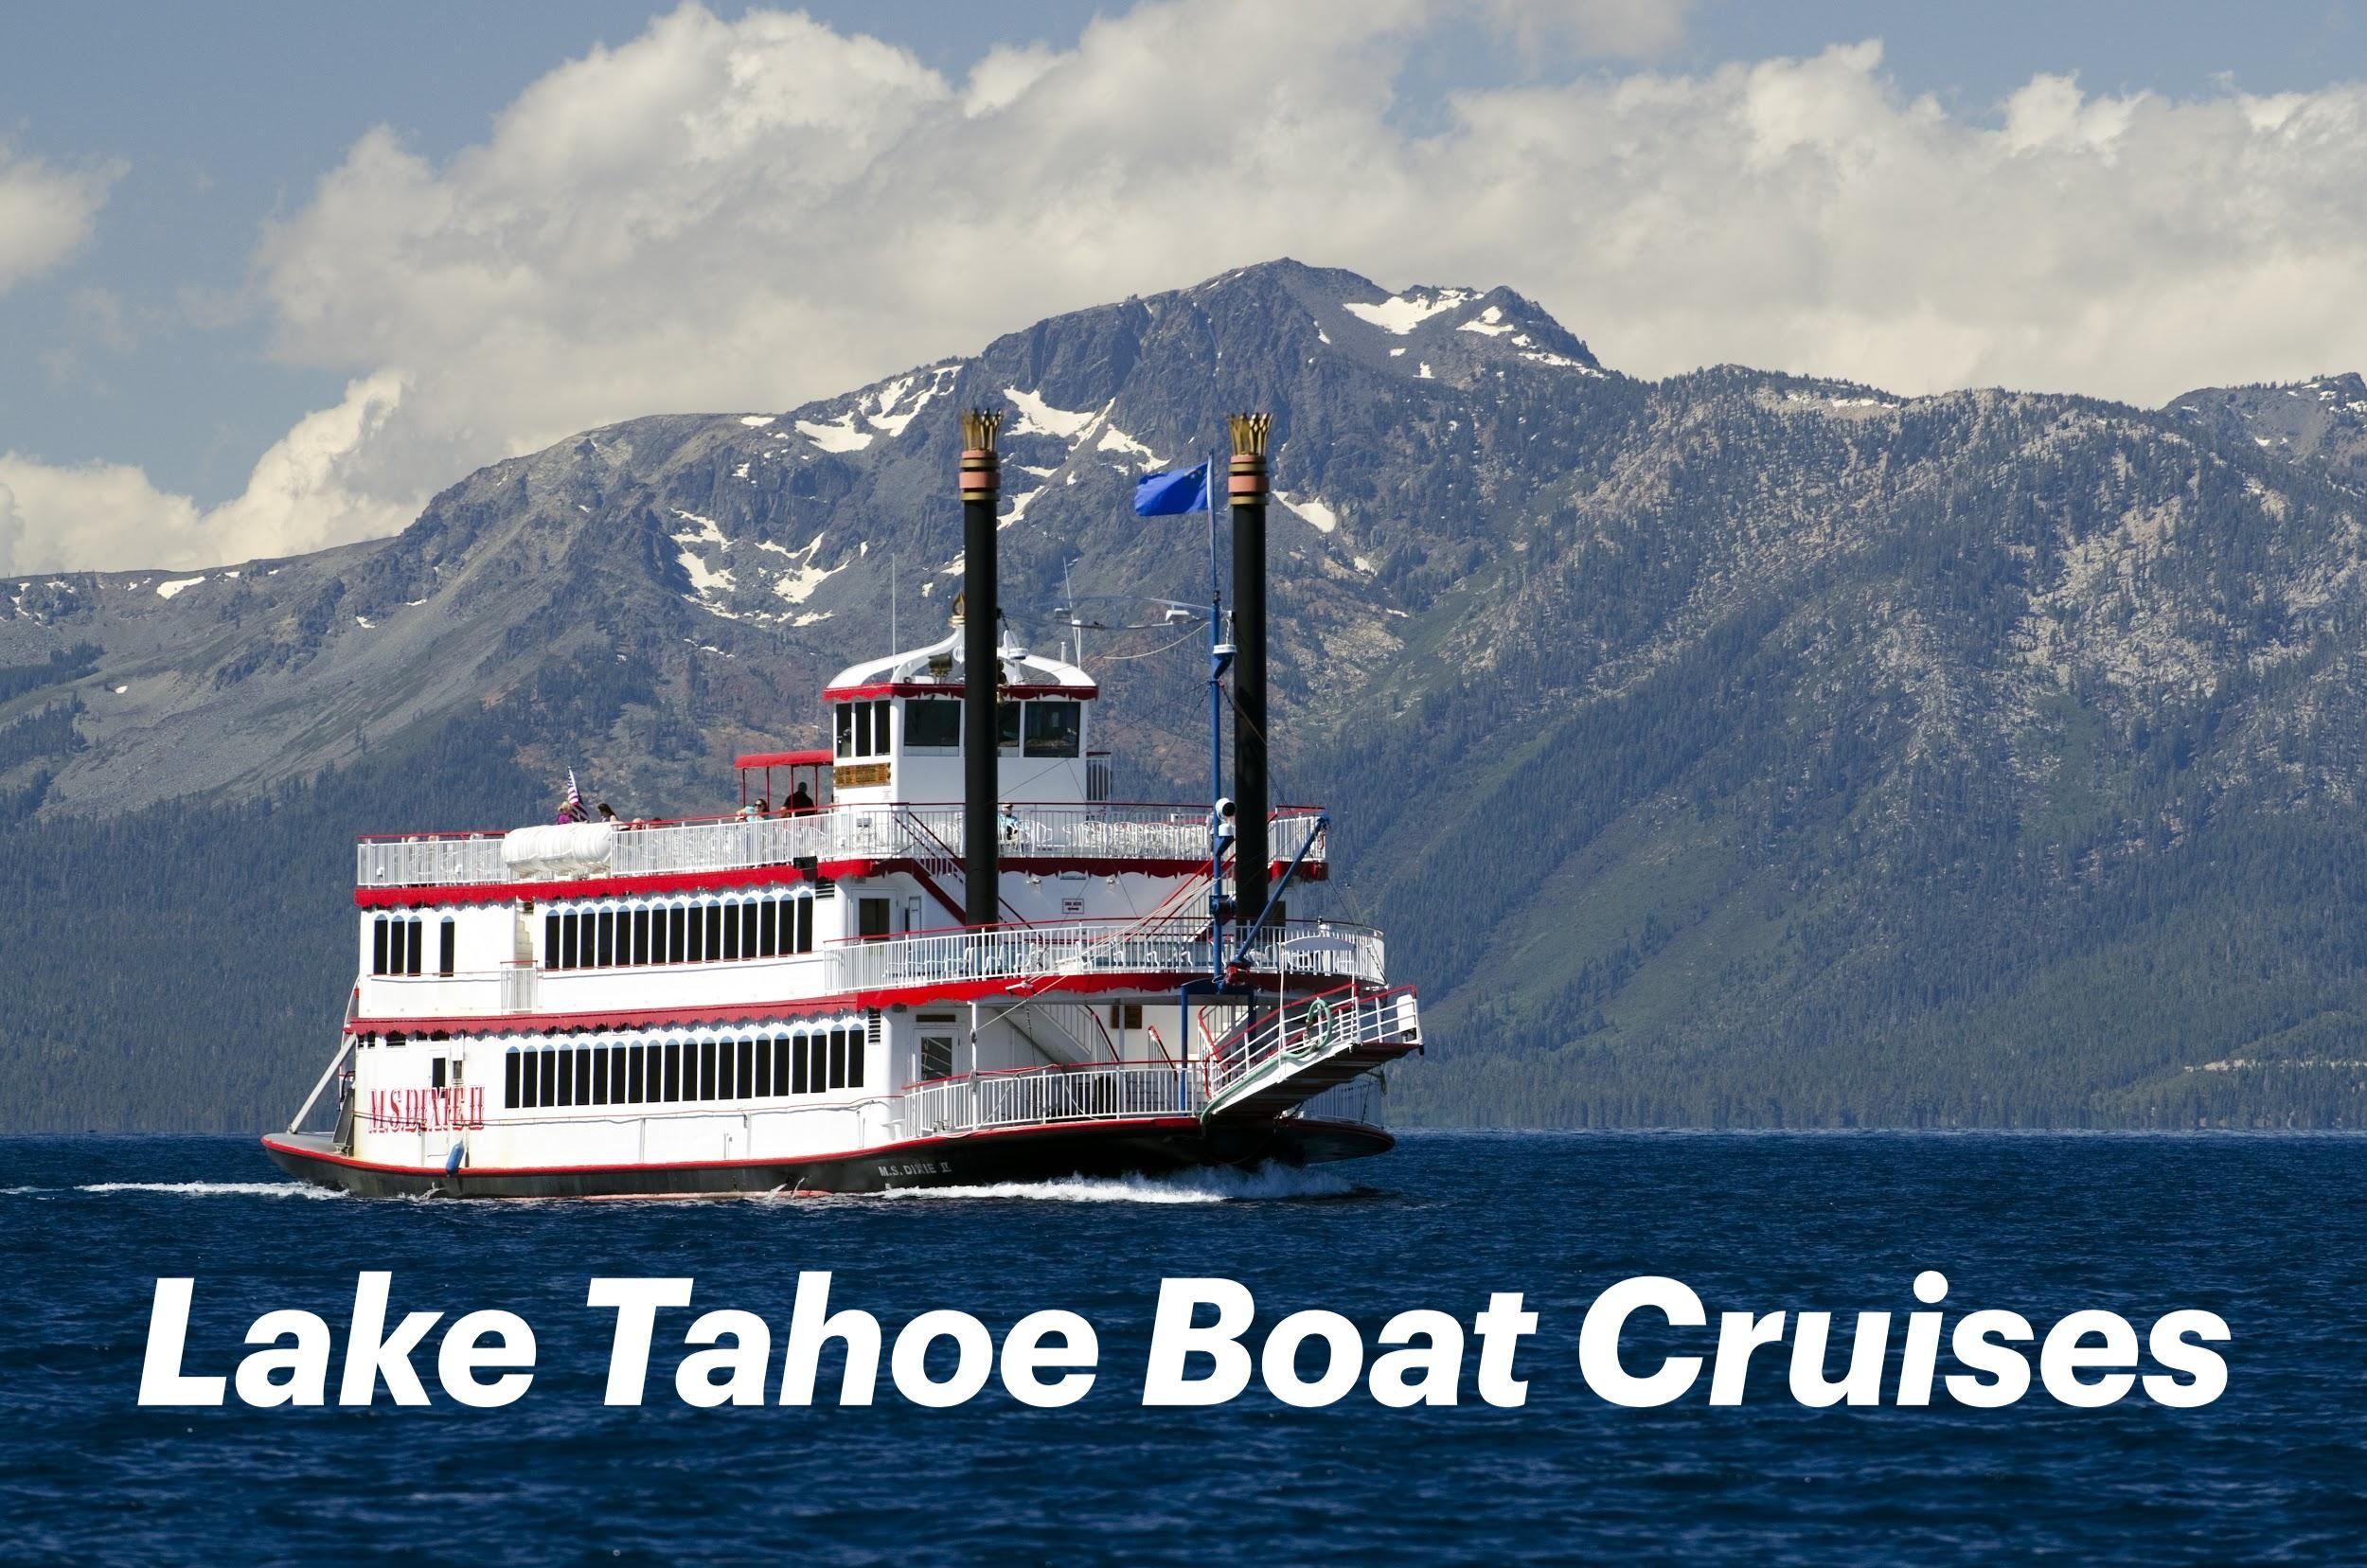 Lake tahoe boat cruise lake tahoe cruise tahoe